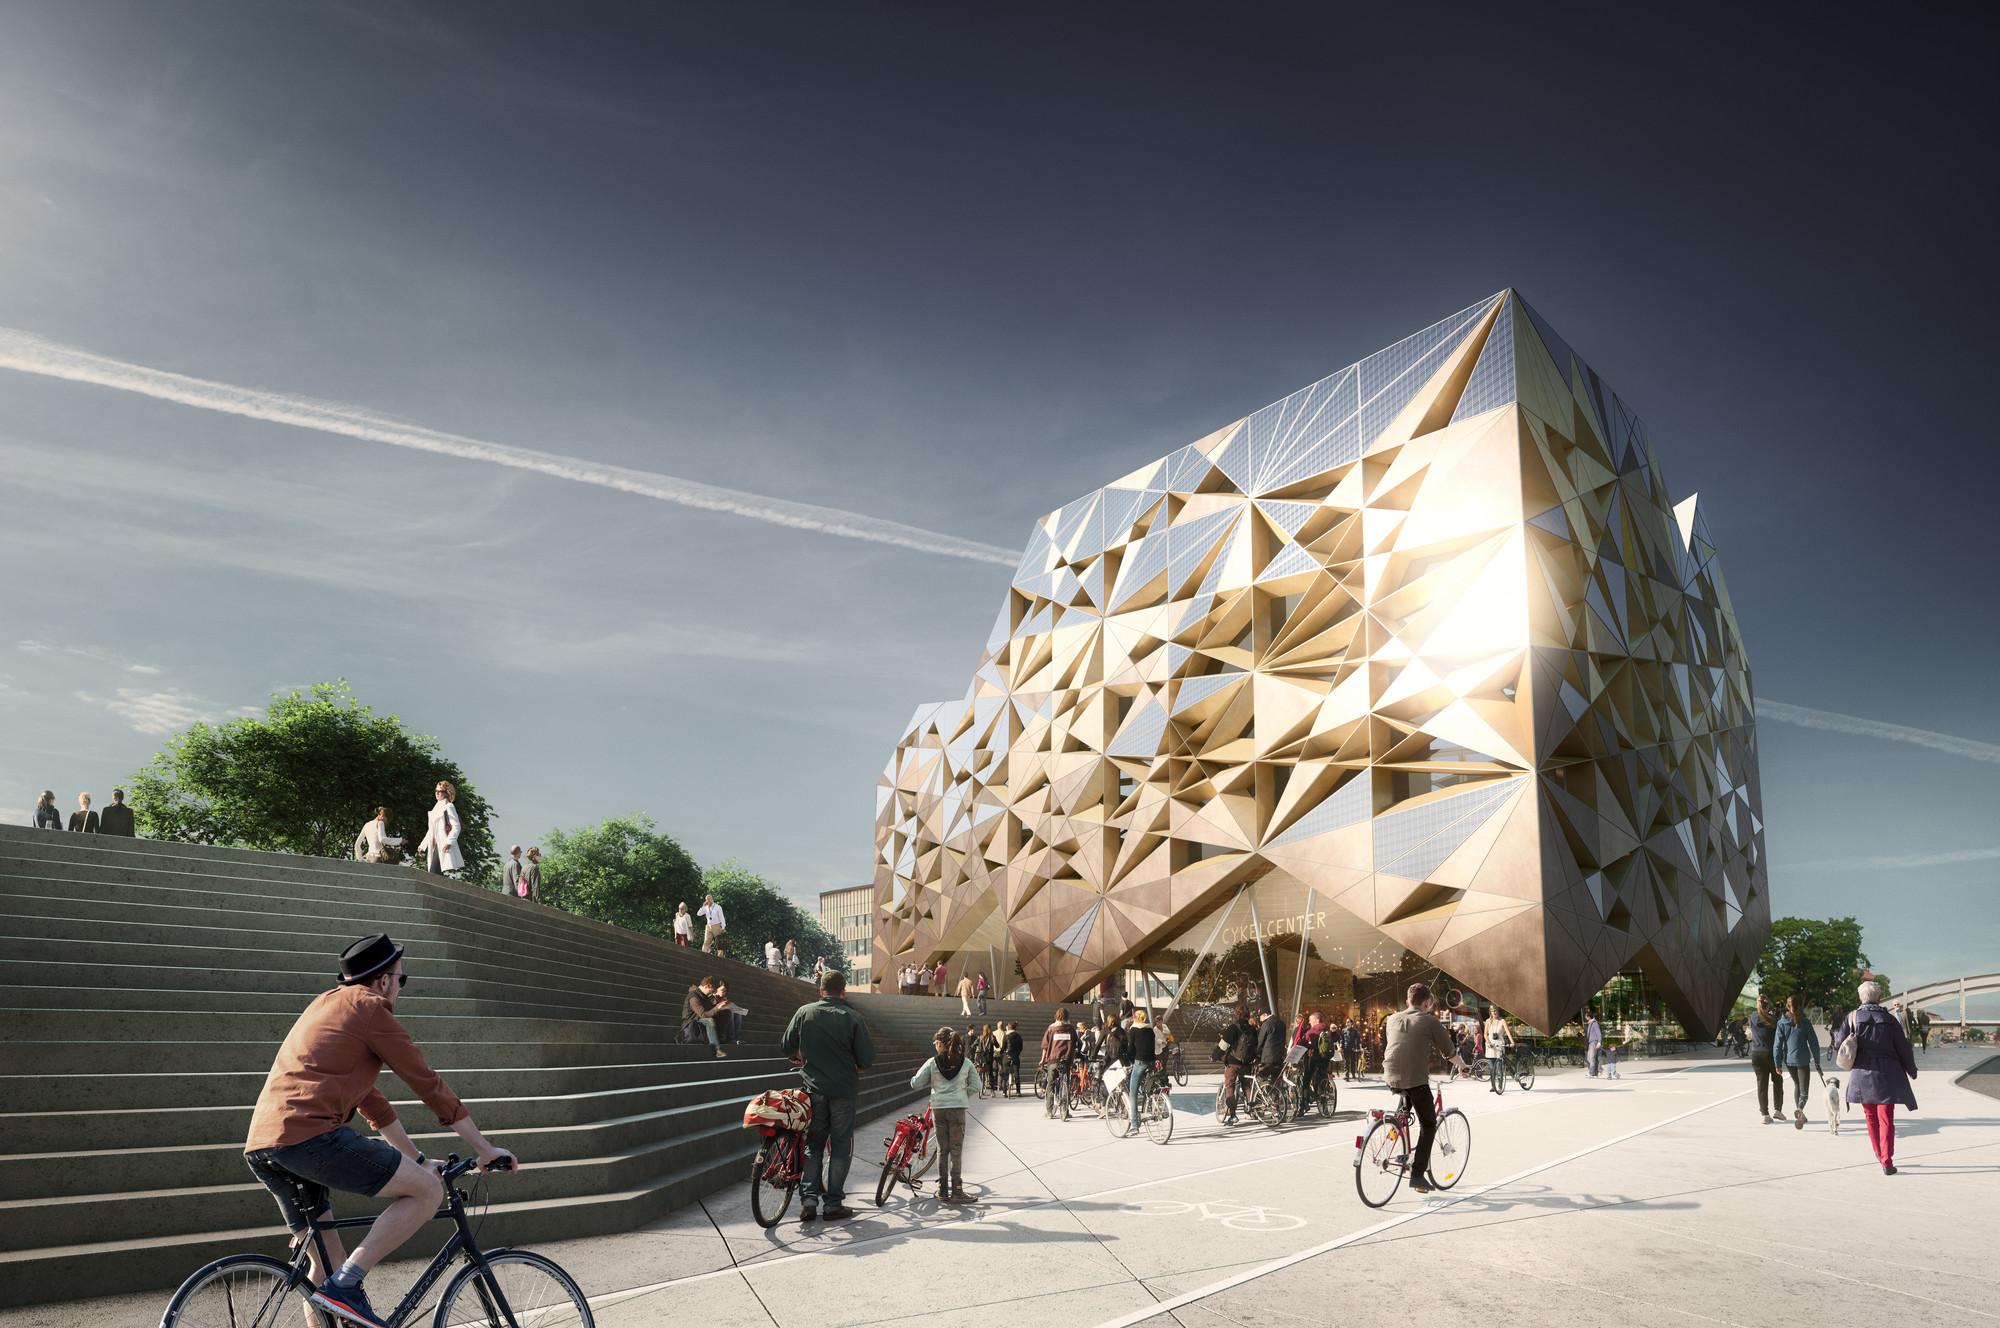 Utopia Arkitekter selecionado para projetar centro de viagens em Uppsala, Suécia, Cortesia de Utopia Arkitekter